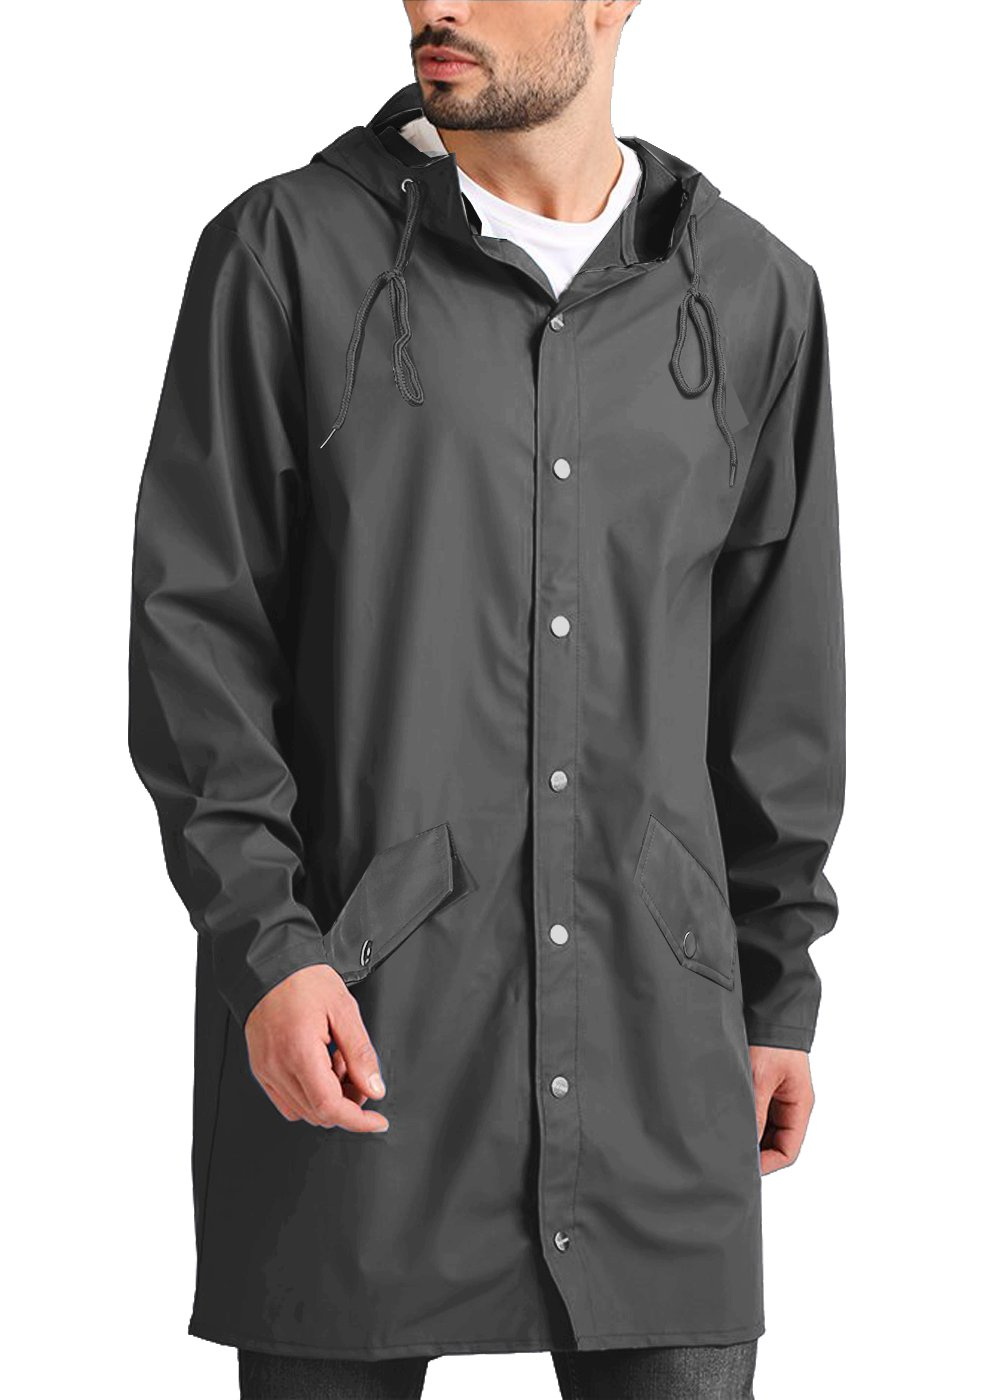 COOFANDY Men's Lightweight Waterproof Rain Jacket Packable Outdoor Hooded Long Raincoat,Grey,Large by COOFANDY